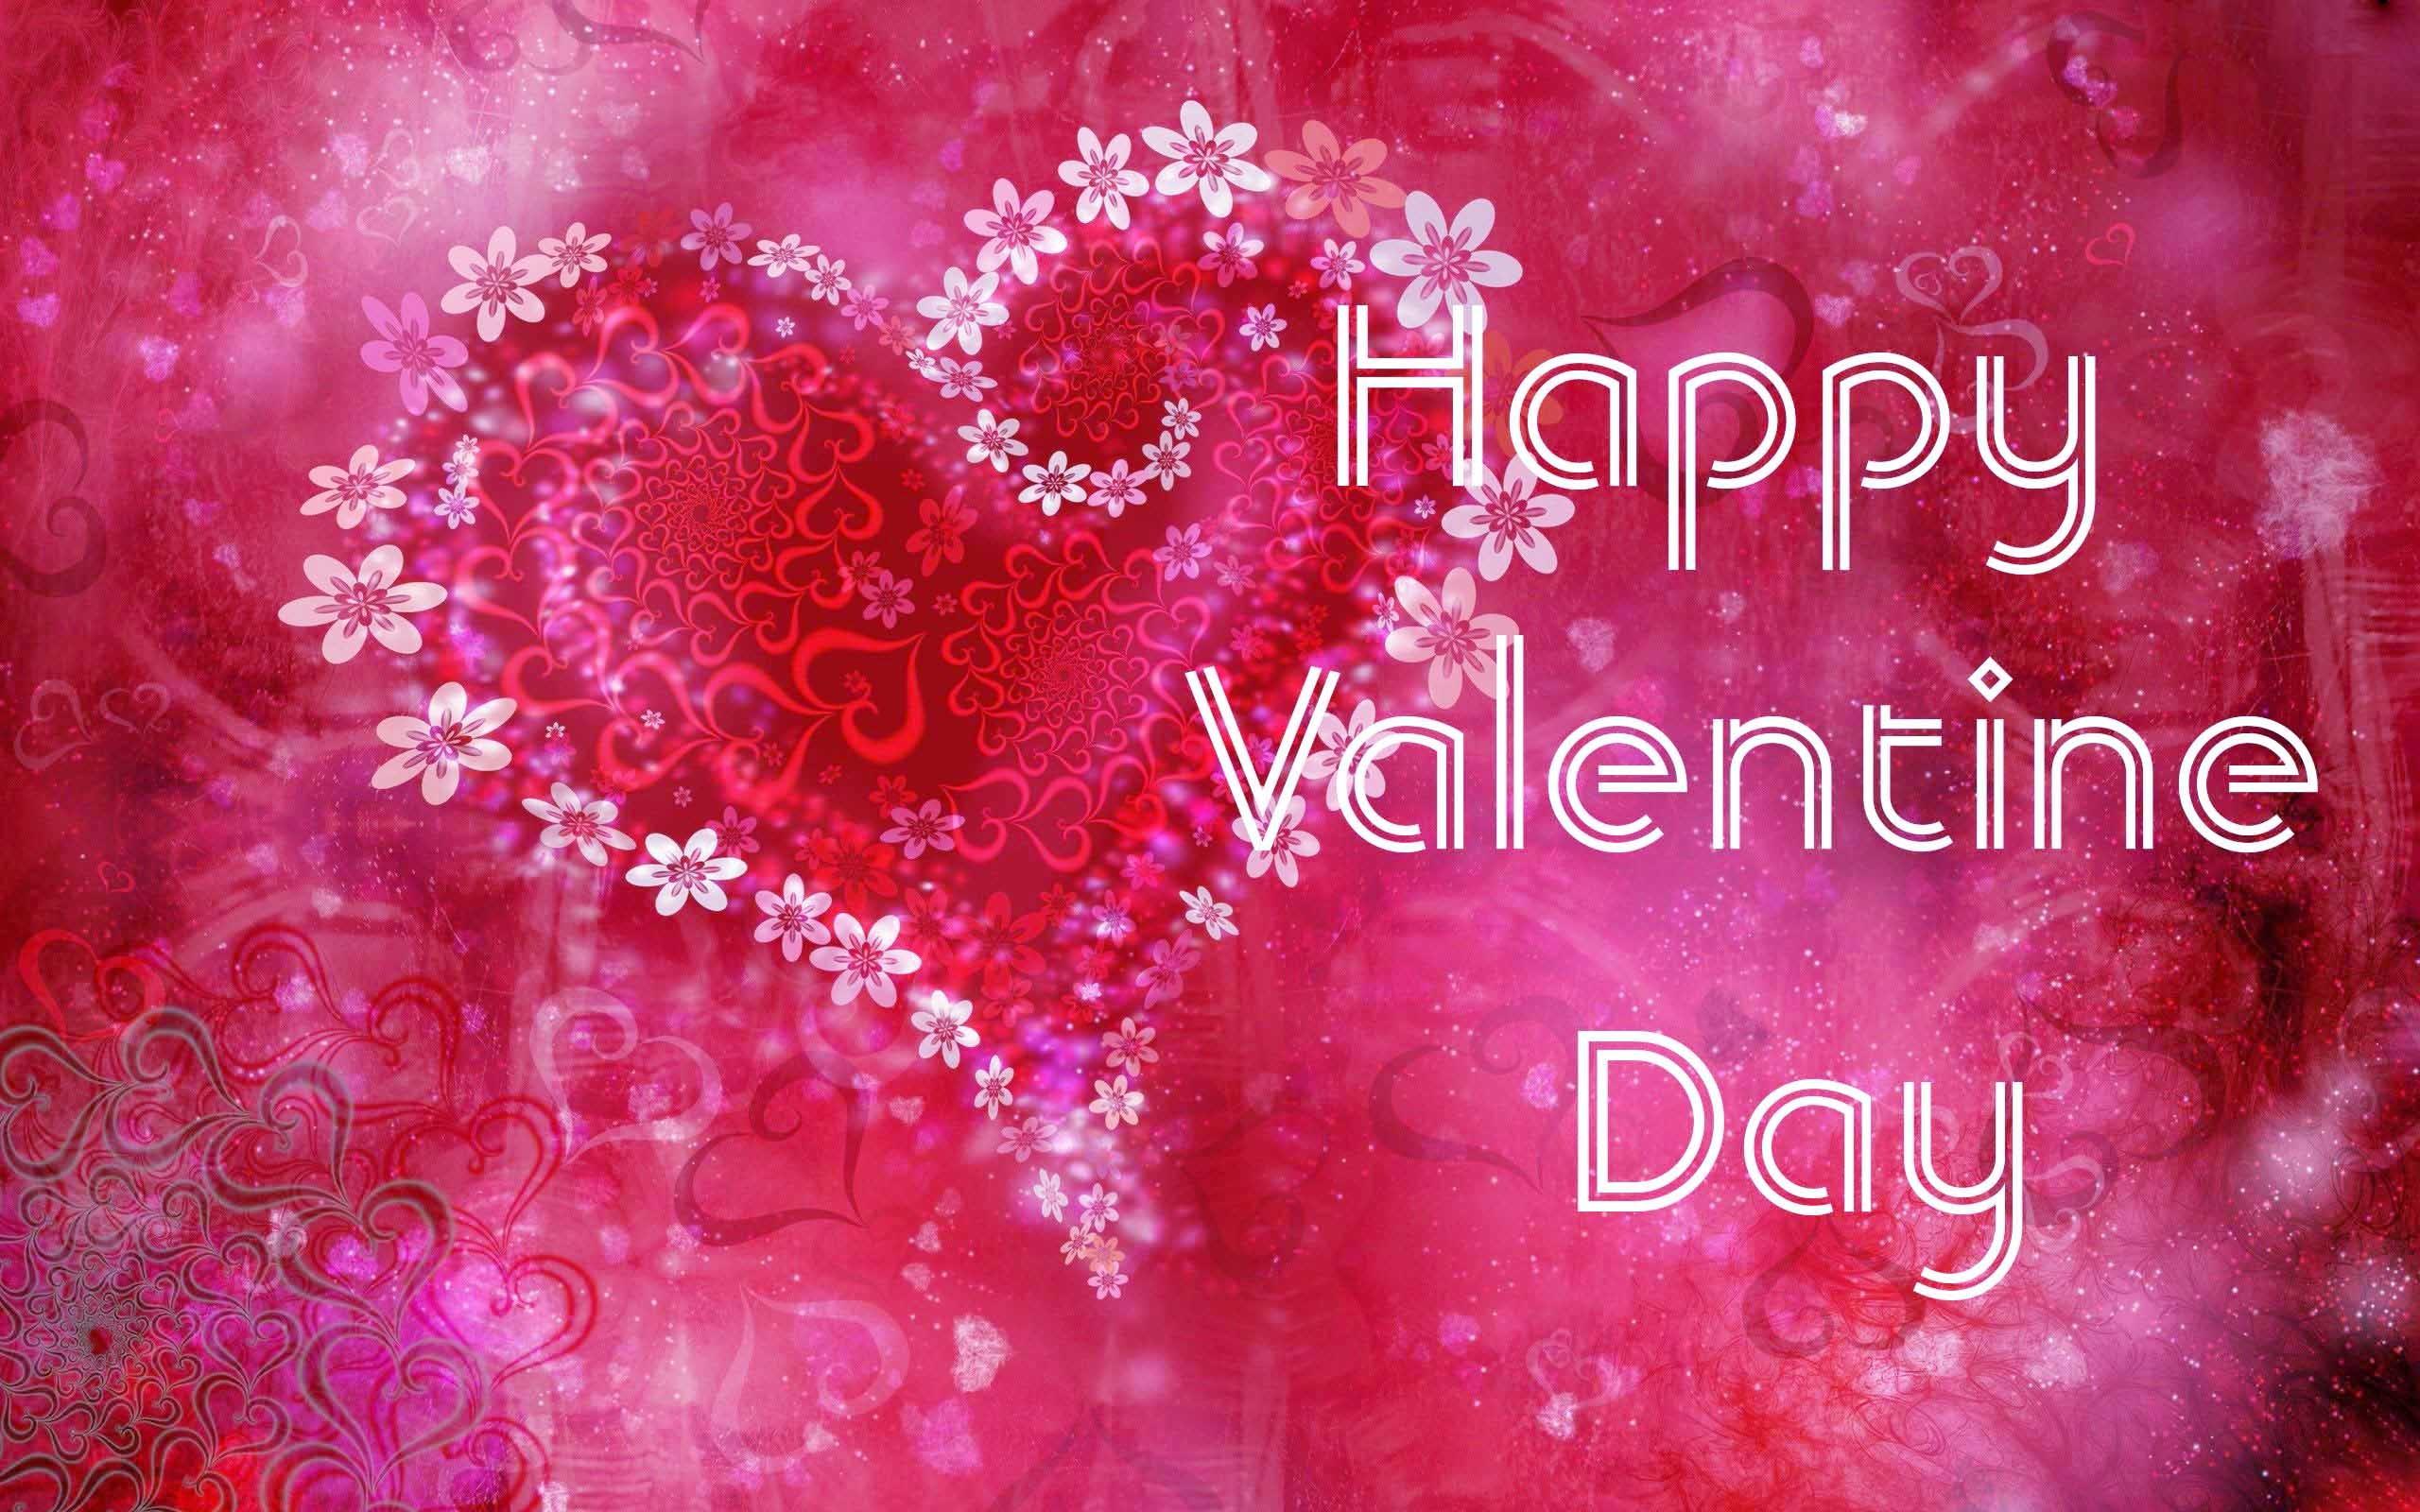 Free HD Valentine's Desktop Wallpaper - WallpaperSafari